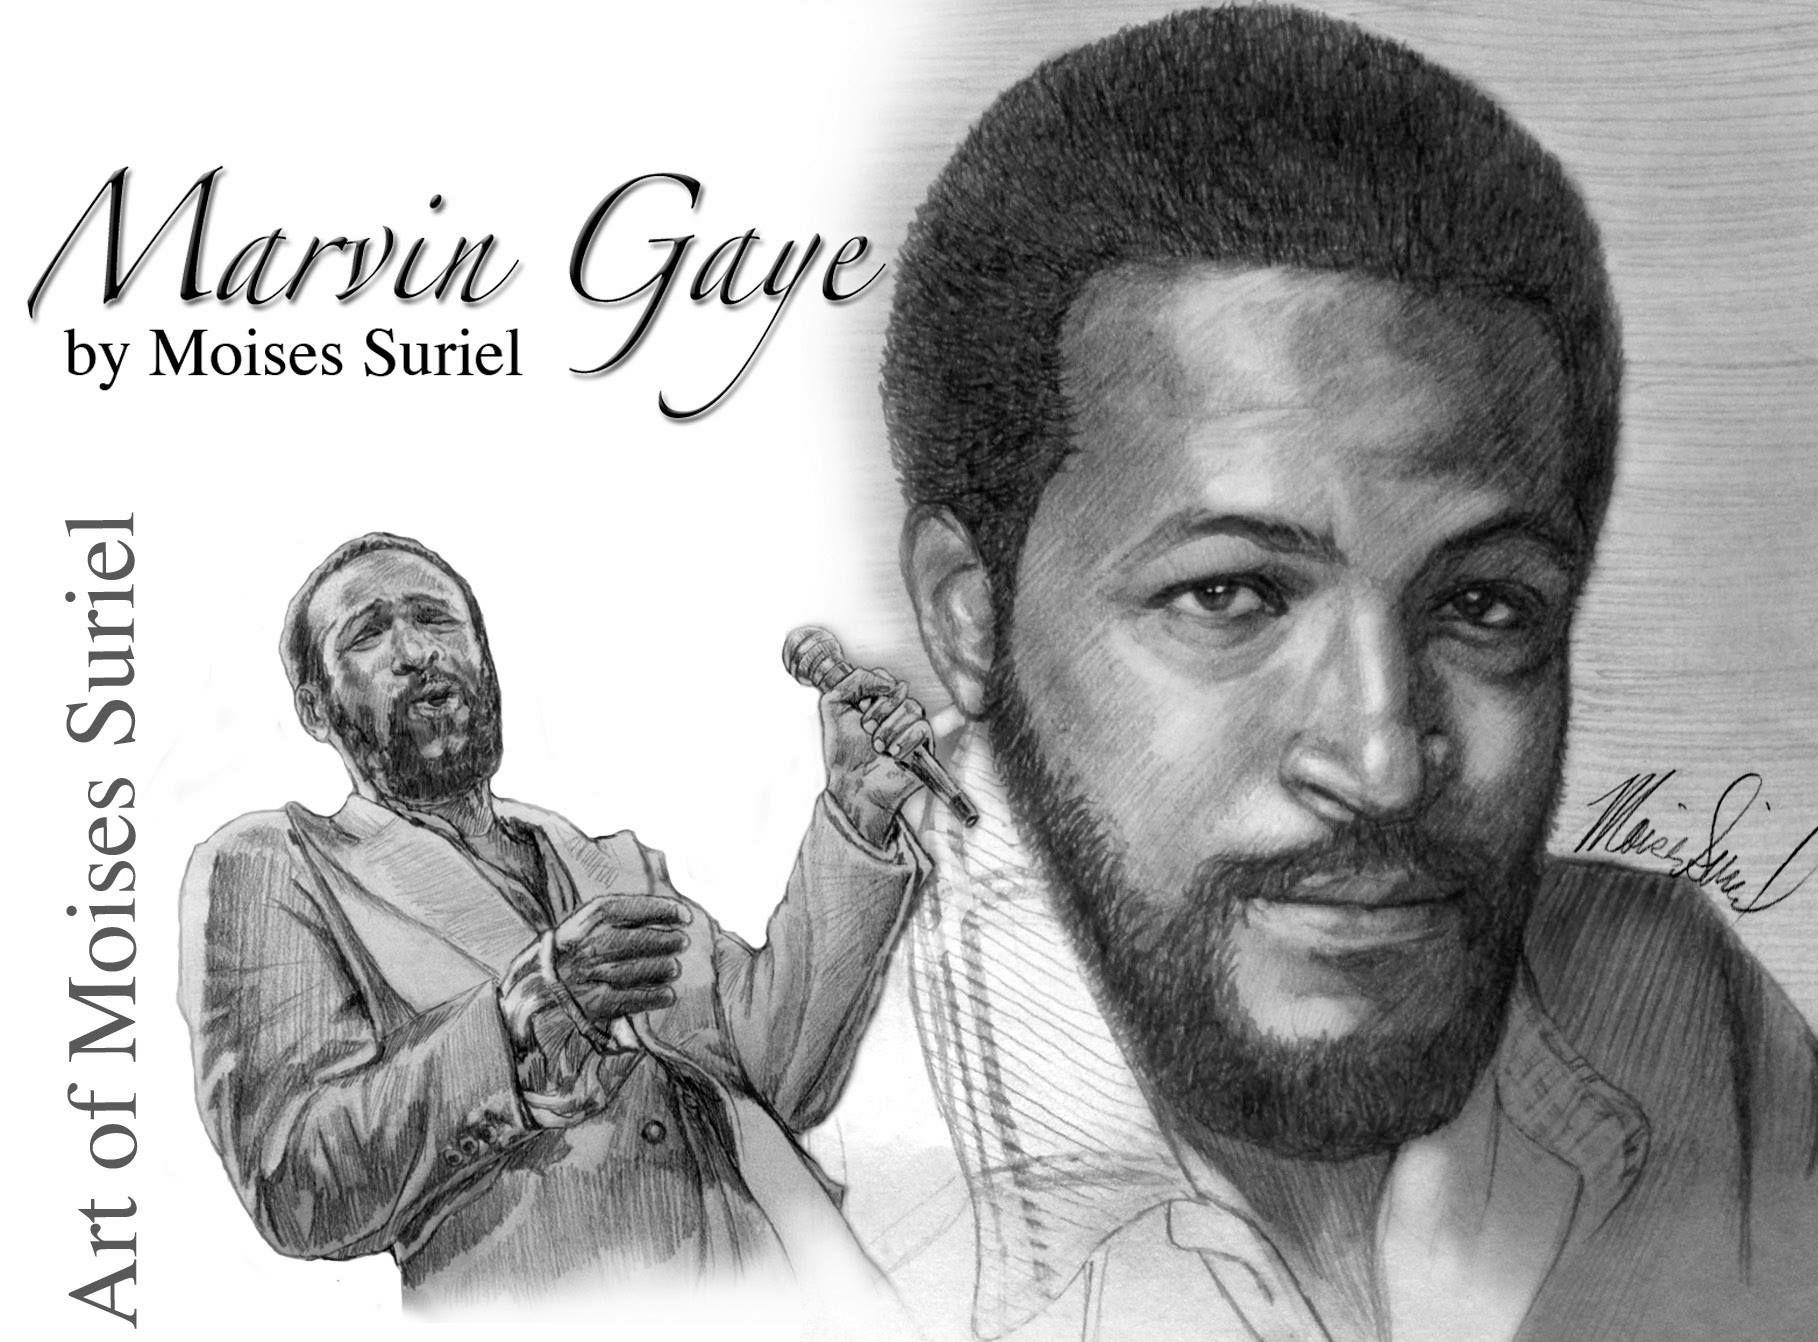 Marvin gaye historical figures historical